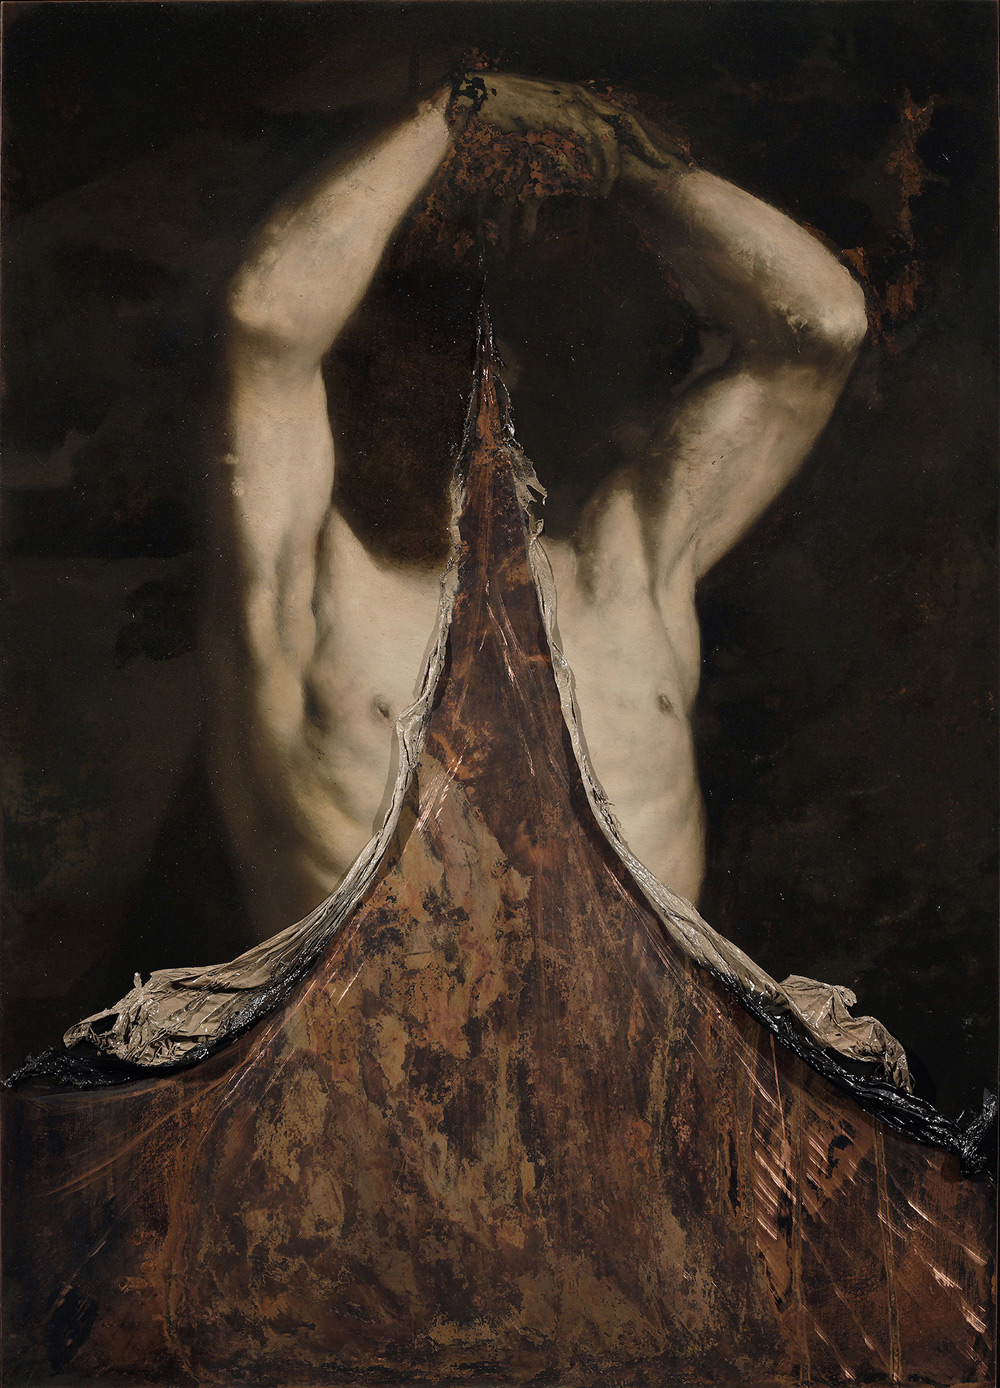 Nicola Samorì, Anulante (2018; olio su rame, 70 x 50 cm. Courtesy Monitor Gallery, Roma)